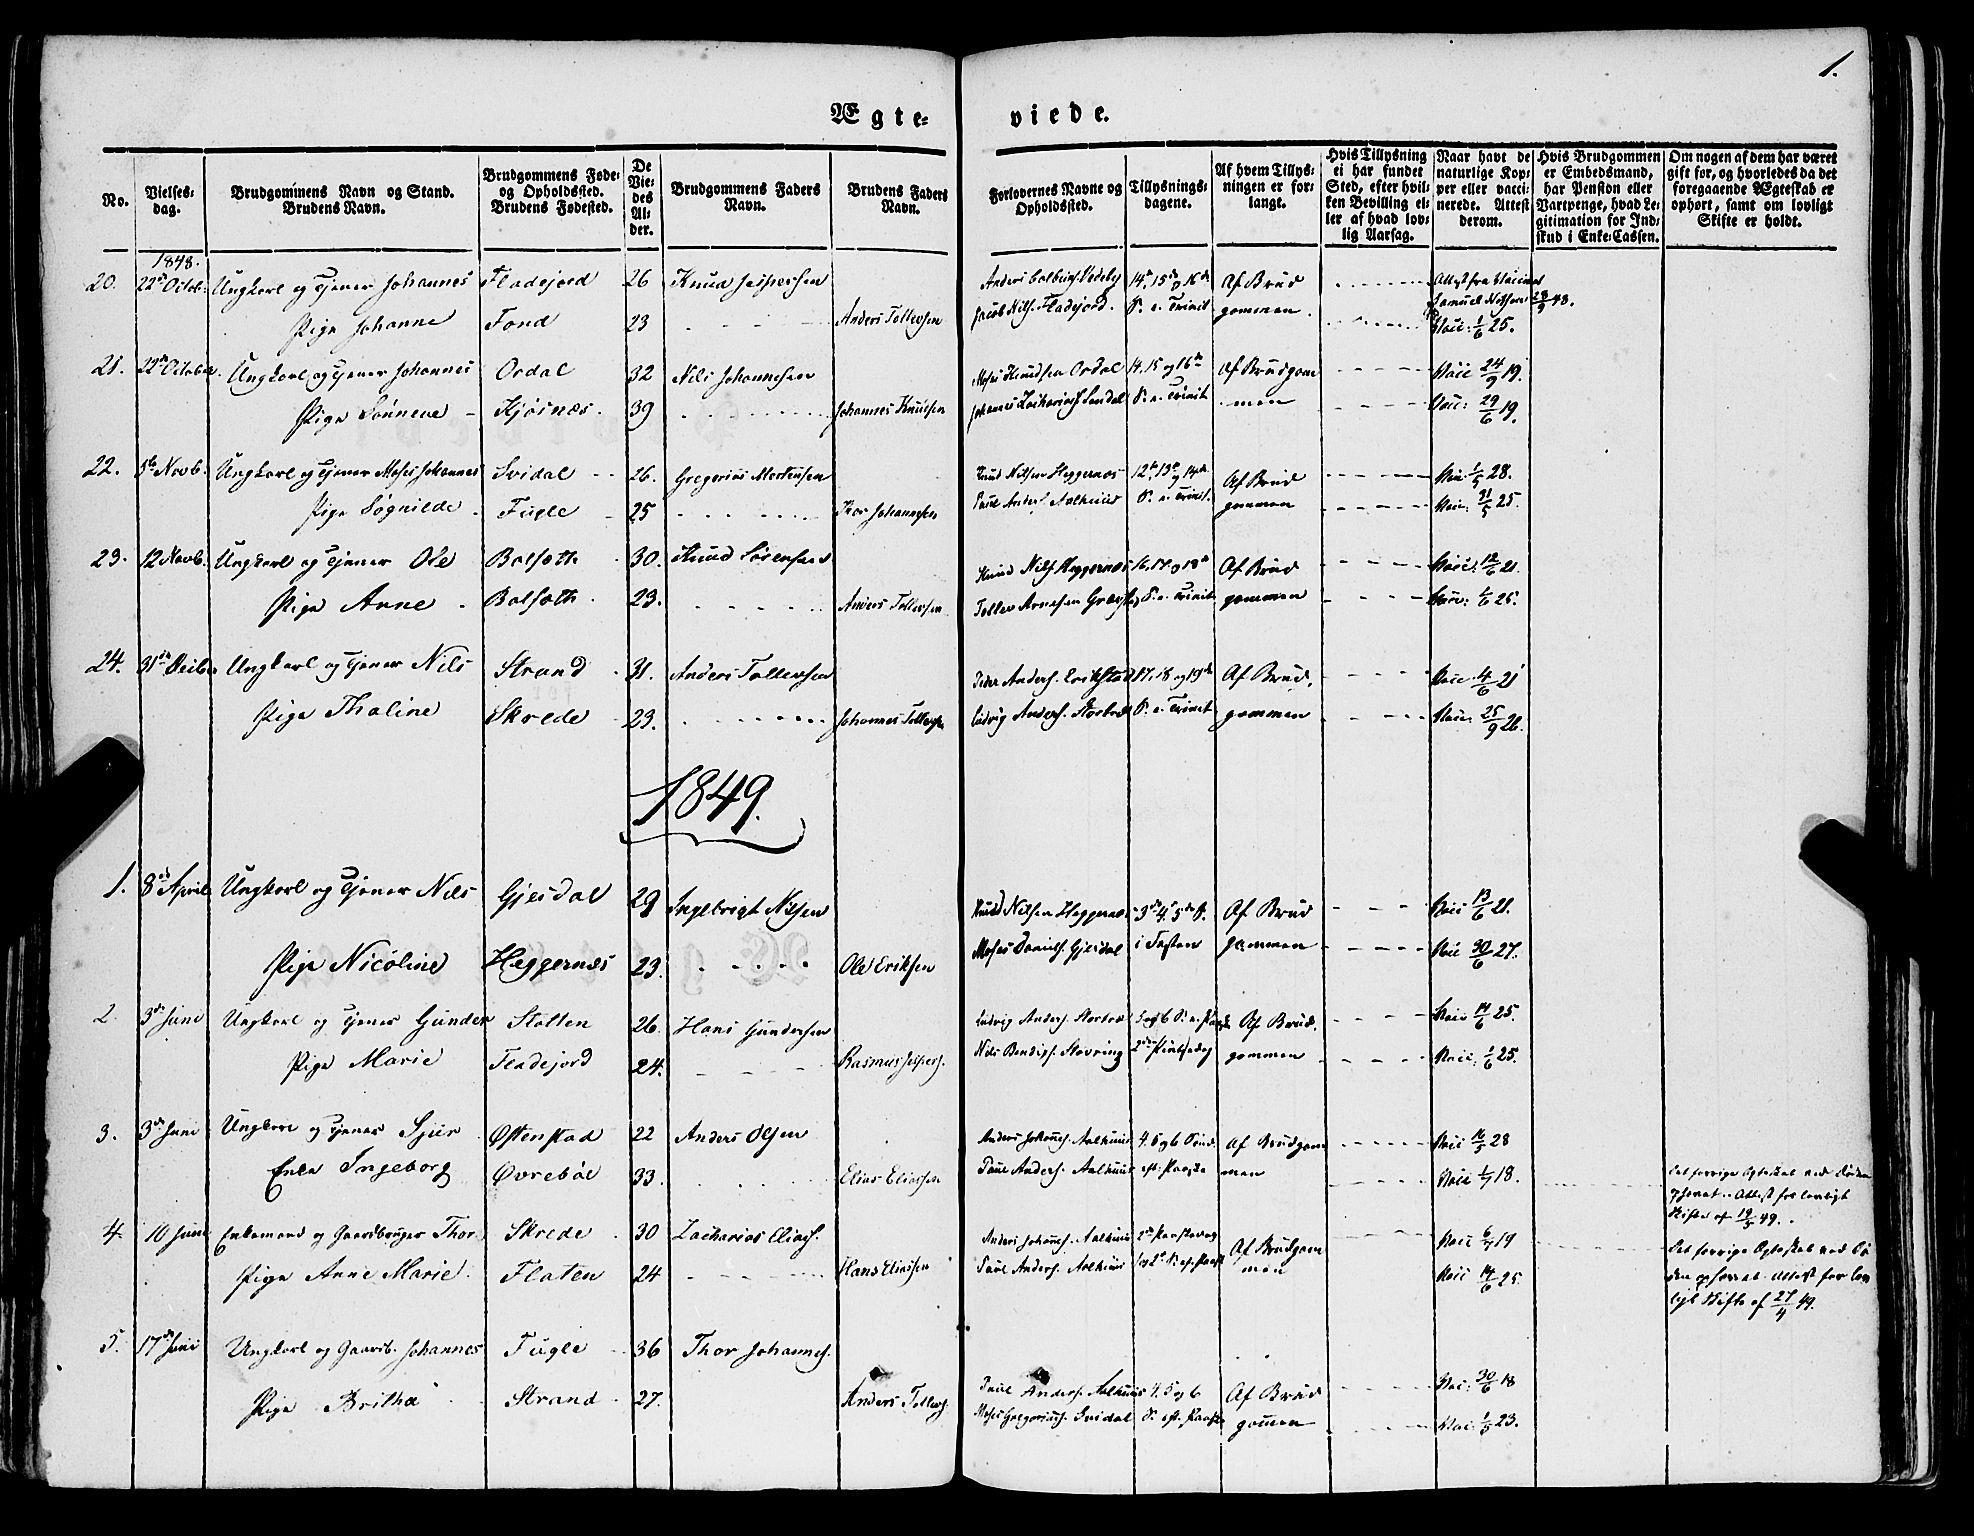 SAB, Jølster sokneprestembete, H/Haa/Haaa/L0010: Parish register (official) no. A 10, 1847-1865, p. 1